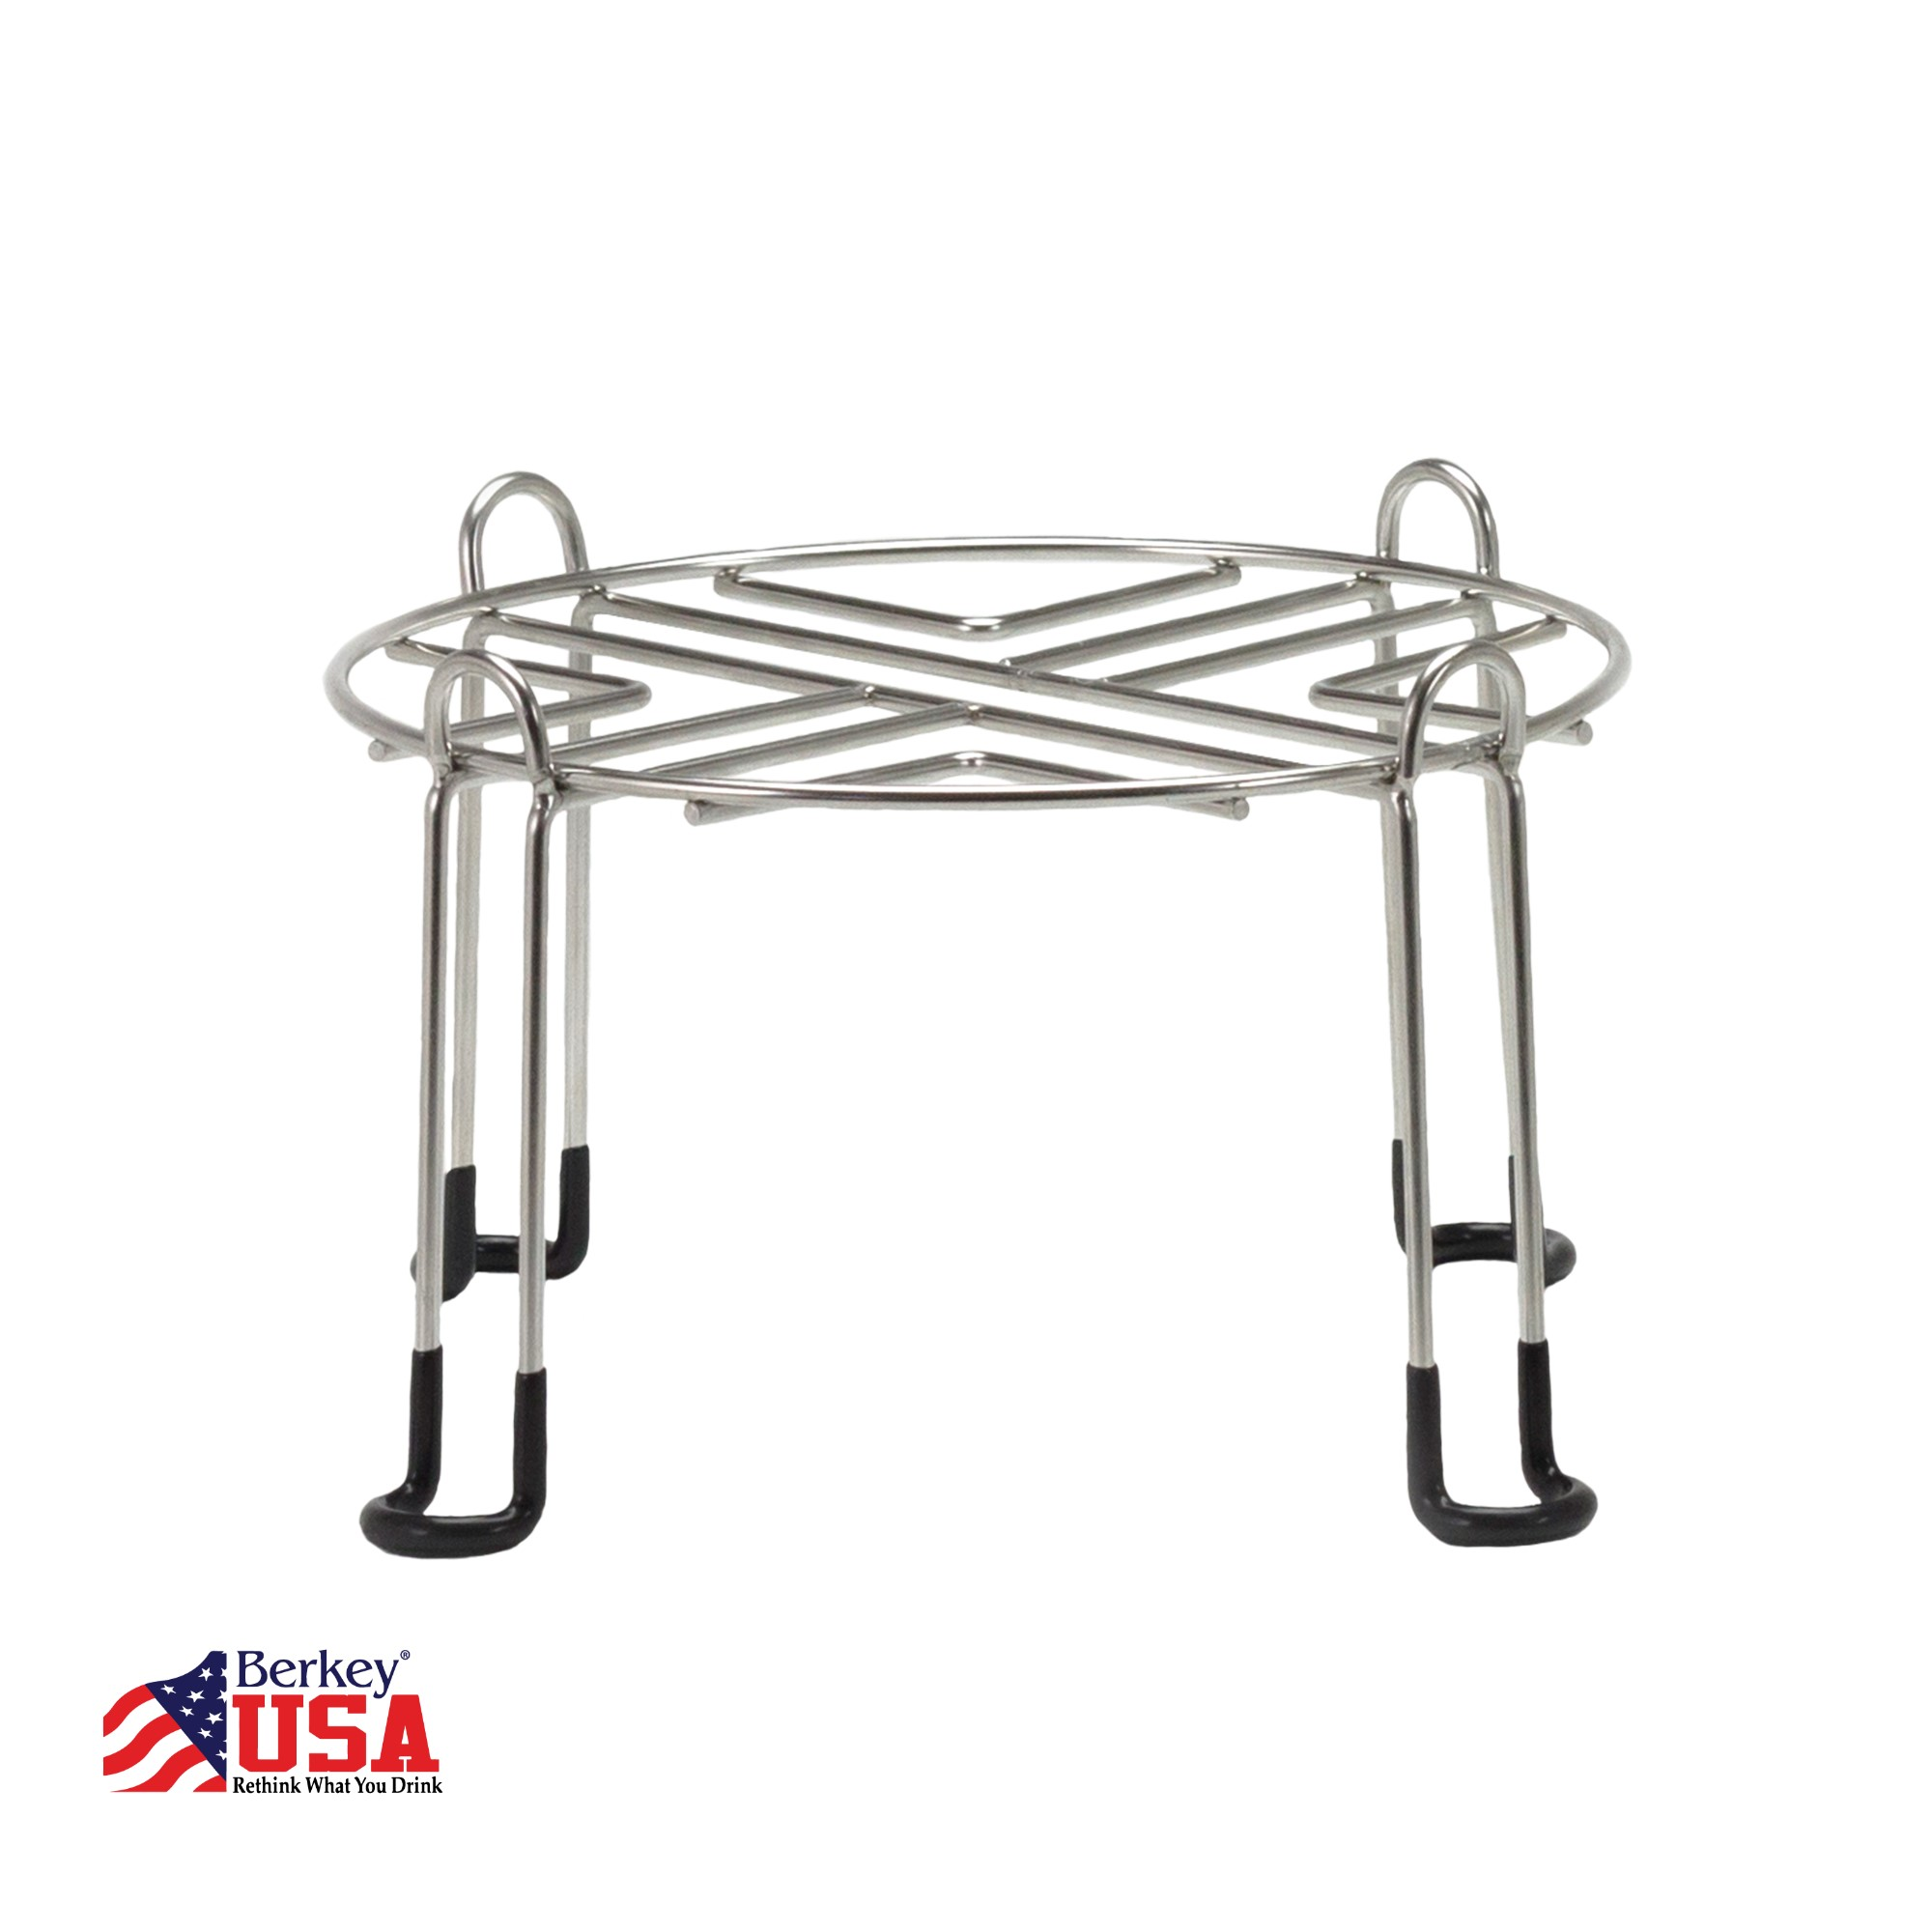 Berkey Base Stainless Steel Wire Stand